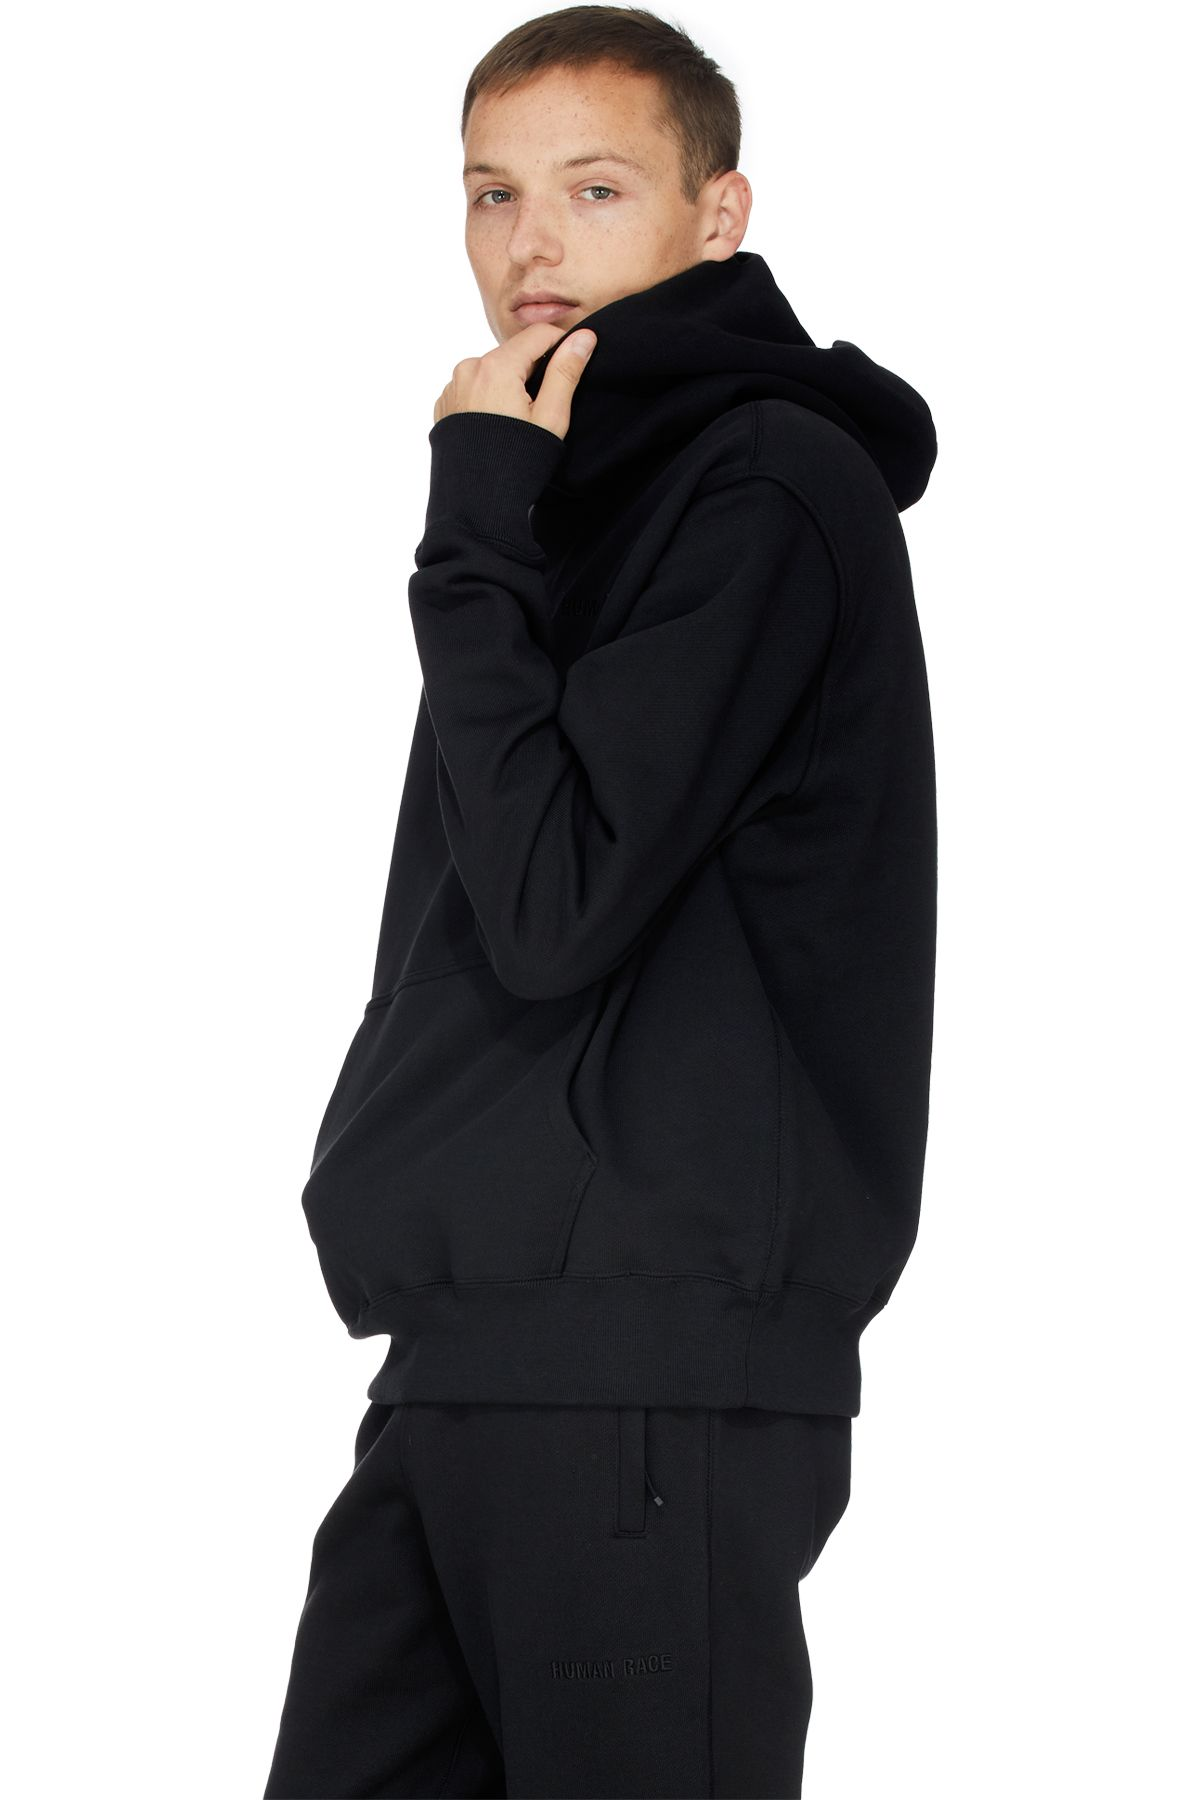 Adidas Originals X Pharrell Williams Pharrell Williams Basics Hoodie Black Black Hoodie Pharrell Williams Pharrell [ 1800 x 1200 Pixel ]